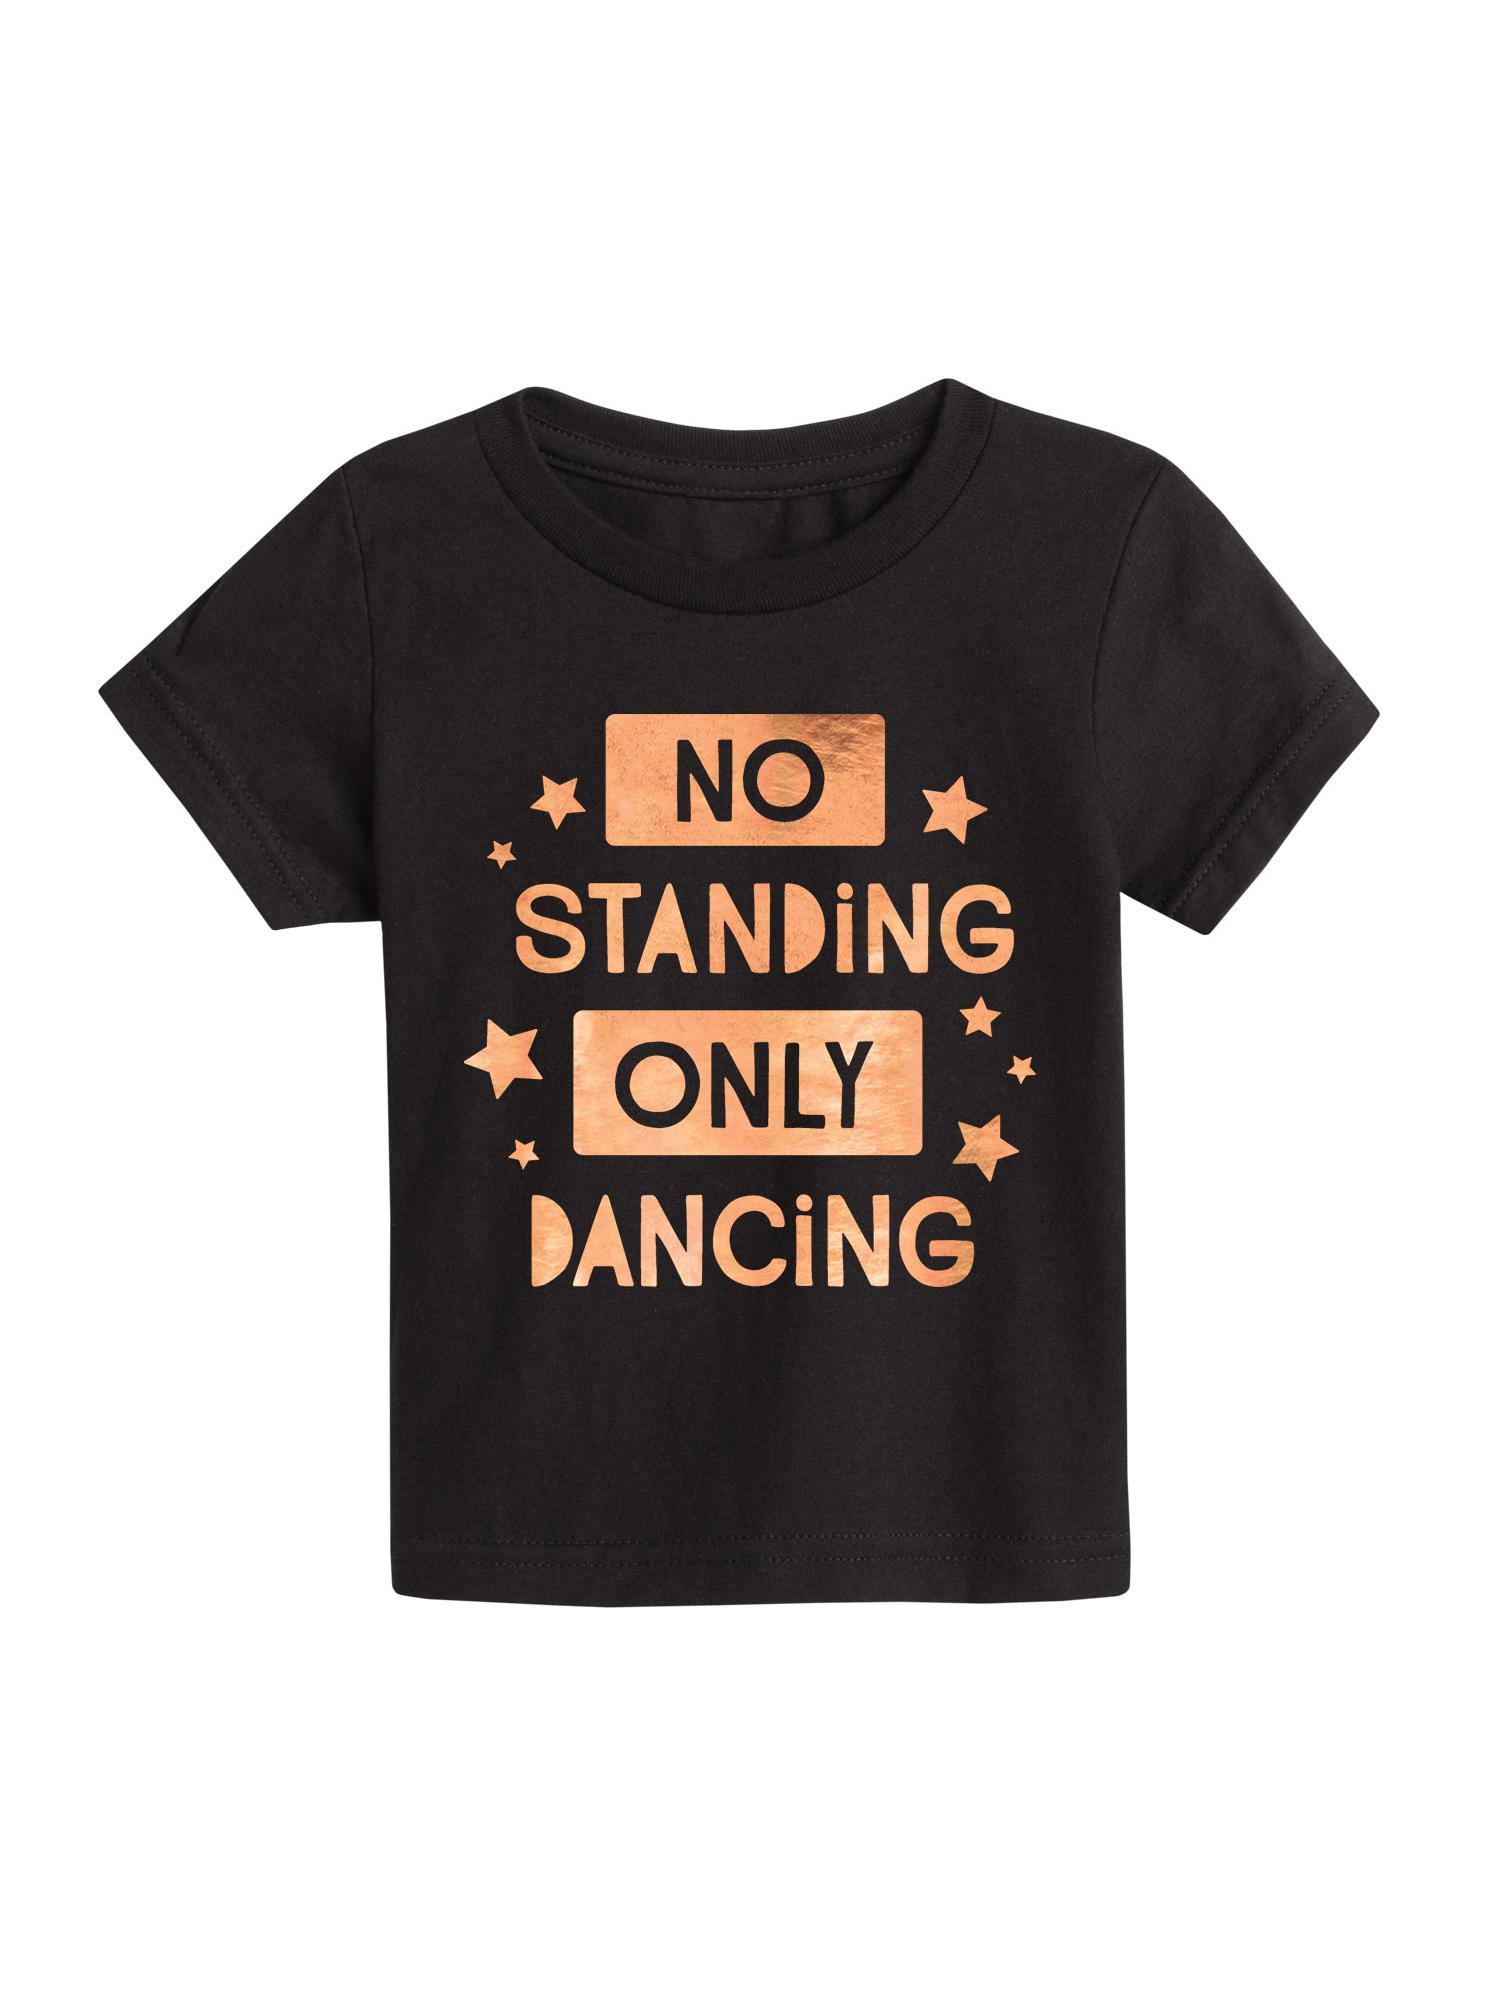 Only Dancing Rose Gold Foil  - Toddler Short Sleeve Tee